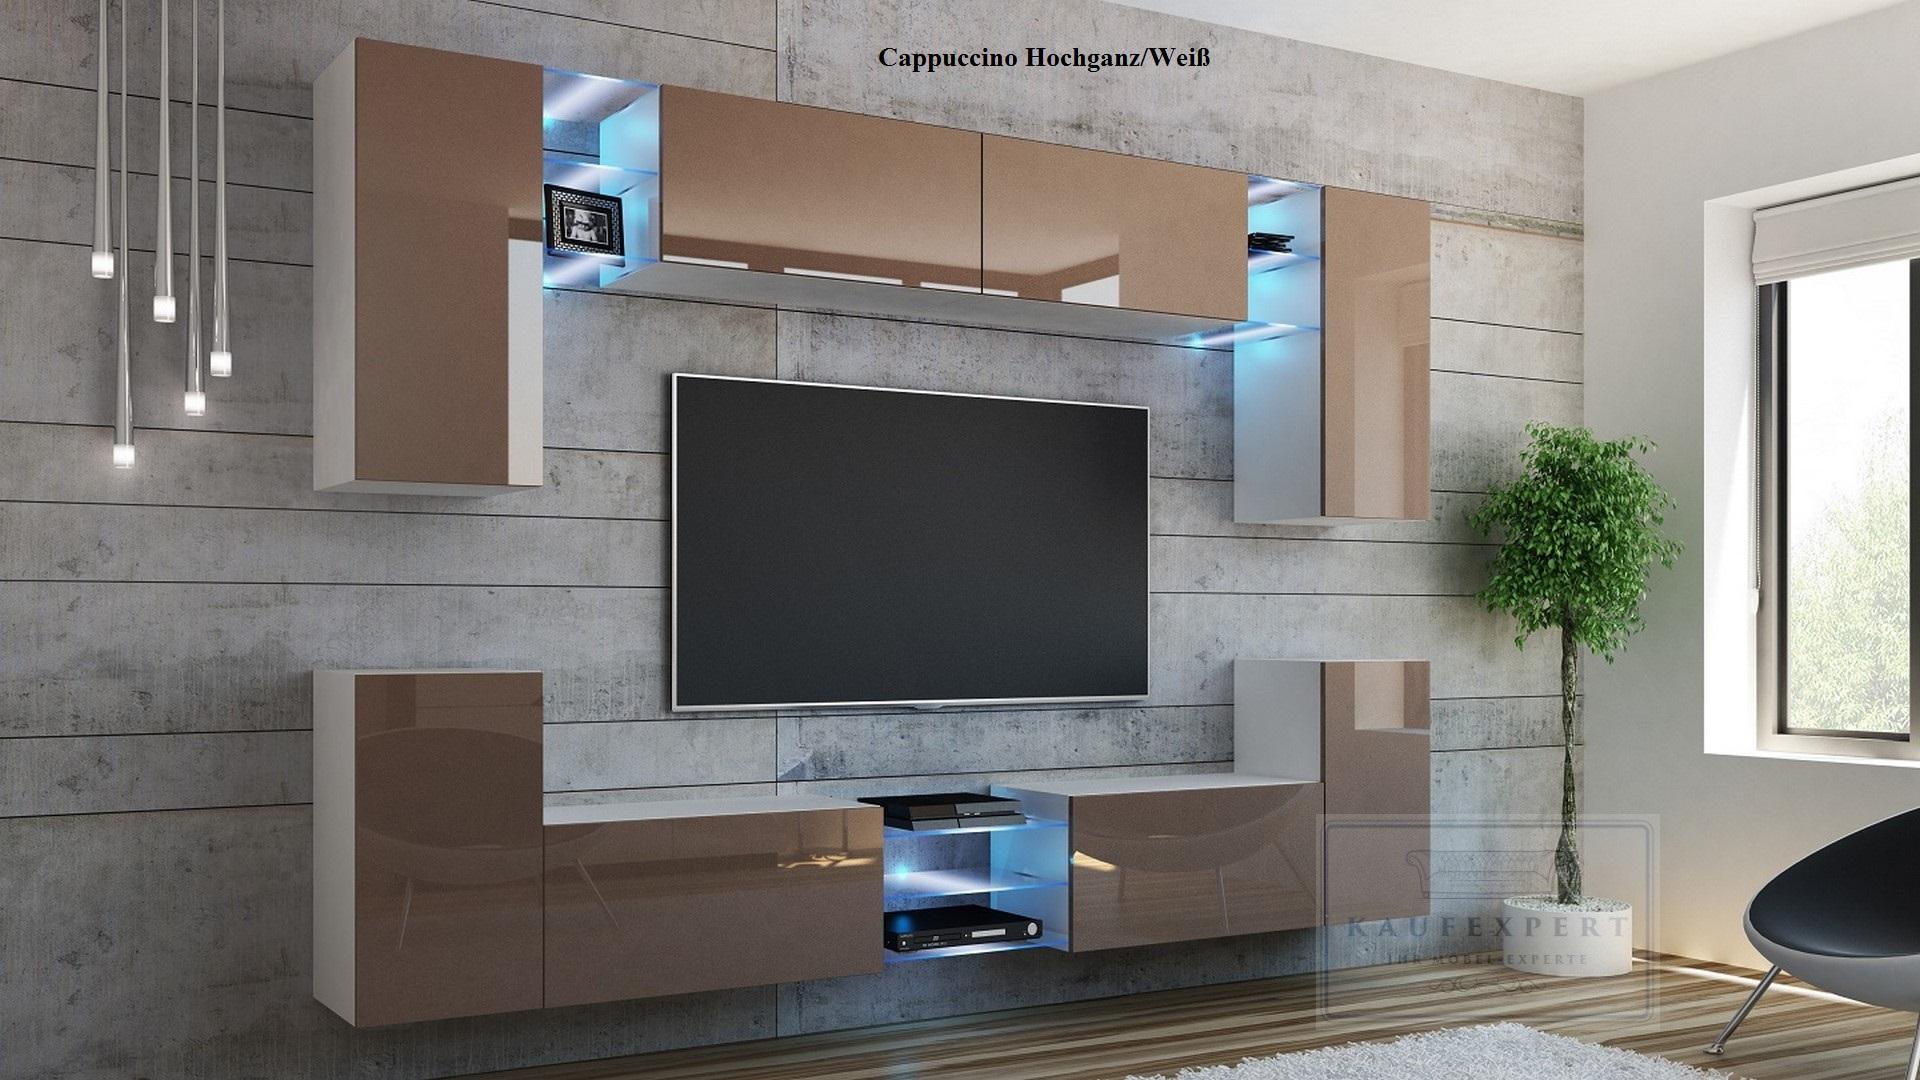 wohnwand galaxy schwarz hochglanz beleuchtung h ngewand. Black Bedroom Furniture Sets. Home Design Ideas